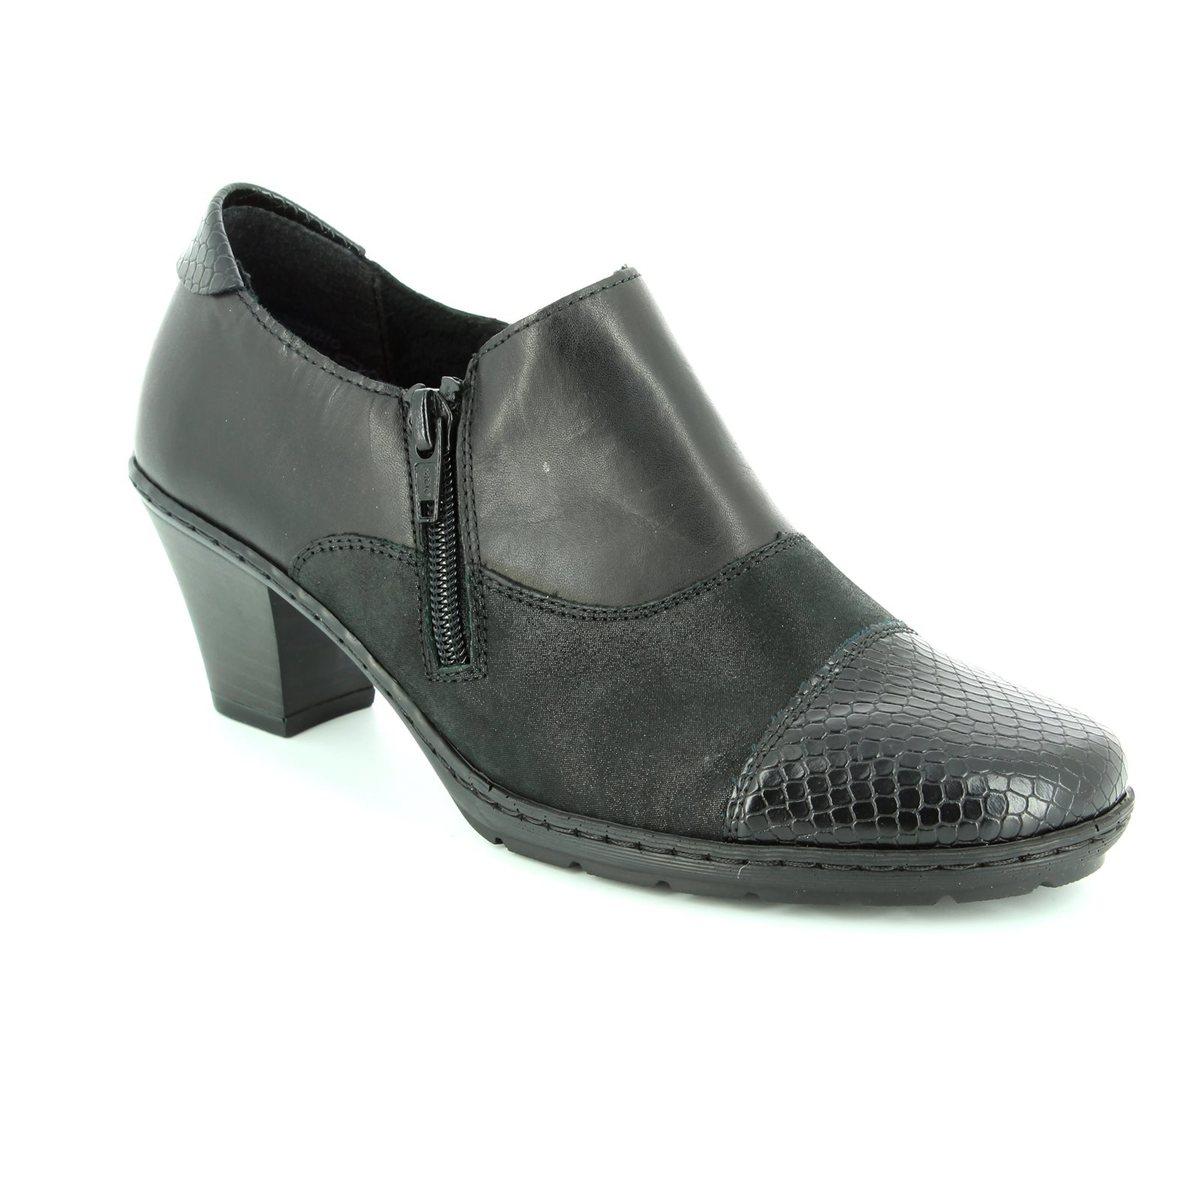 Womens Shoes Large Sizes London